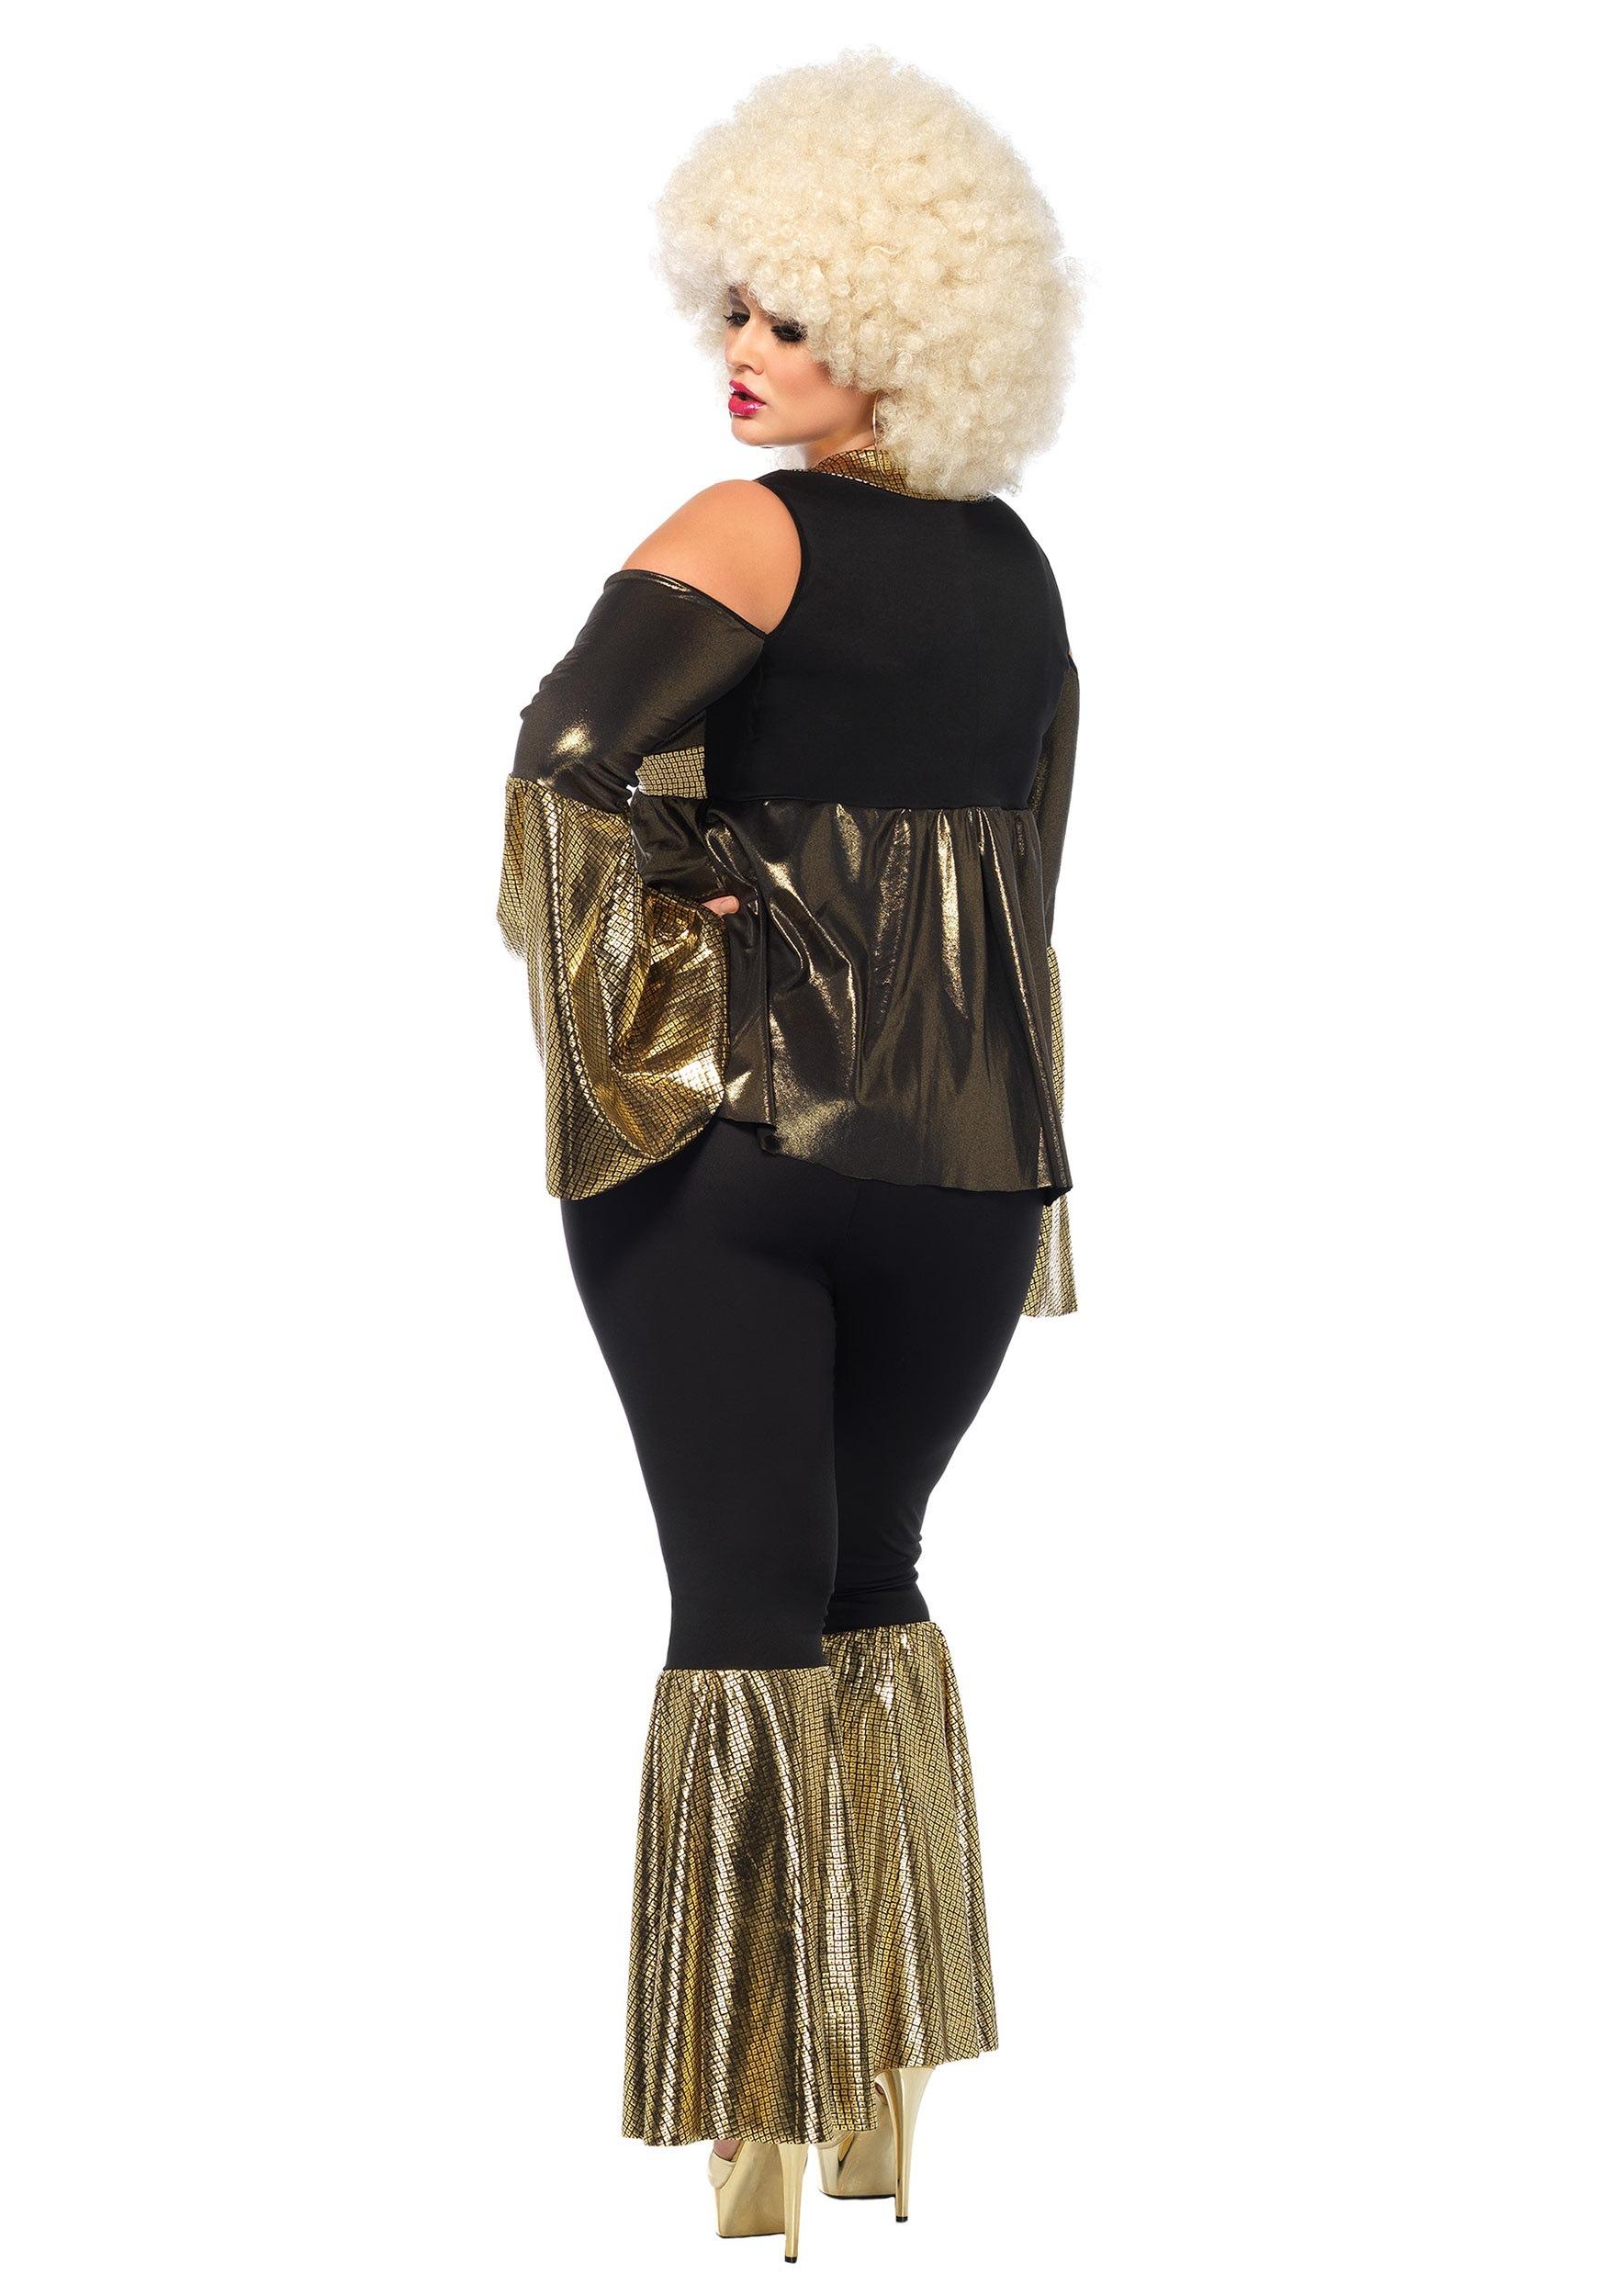 Plus Size Disco Diva Costume  sc 1 st  Fun.com & Disco Diva Plus Size Costume